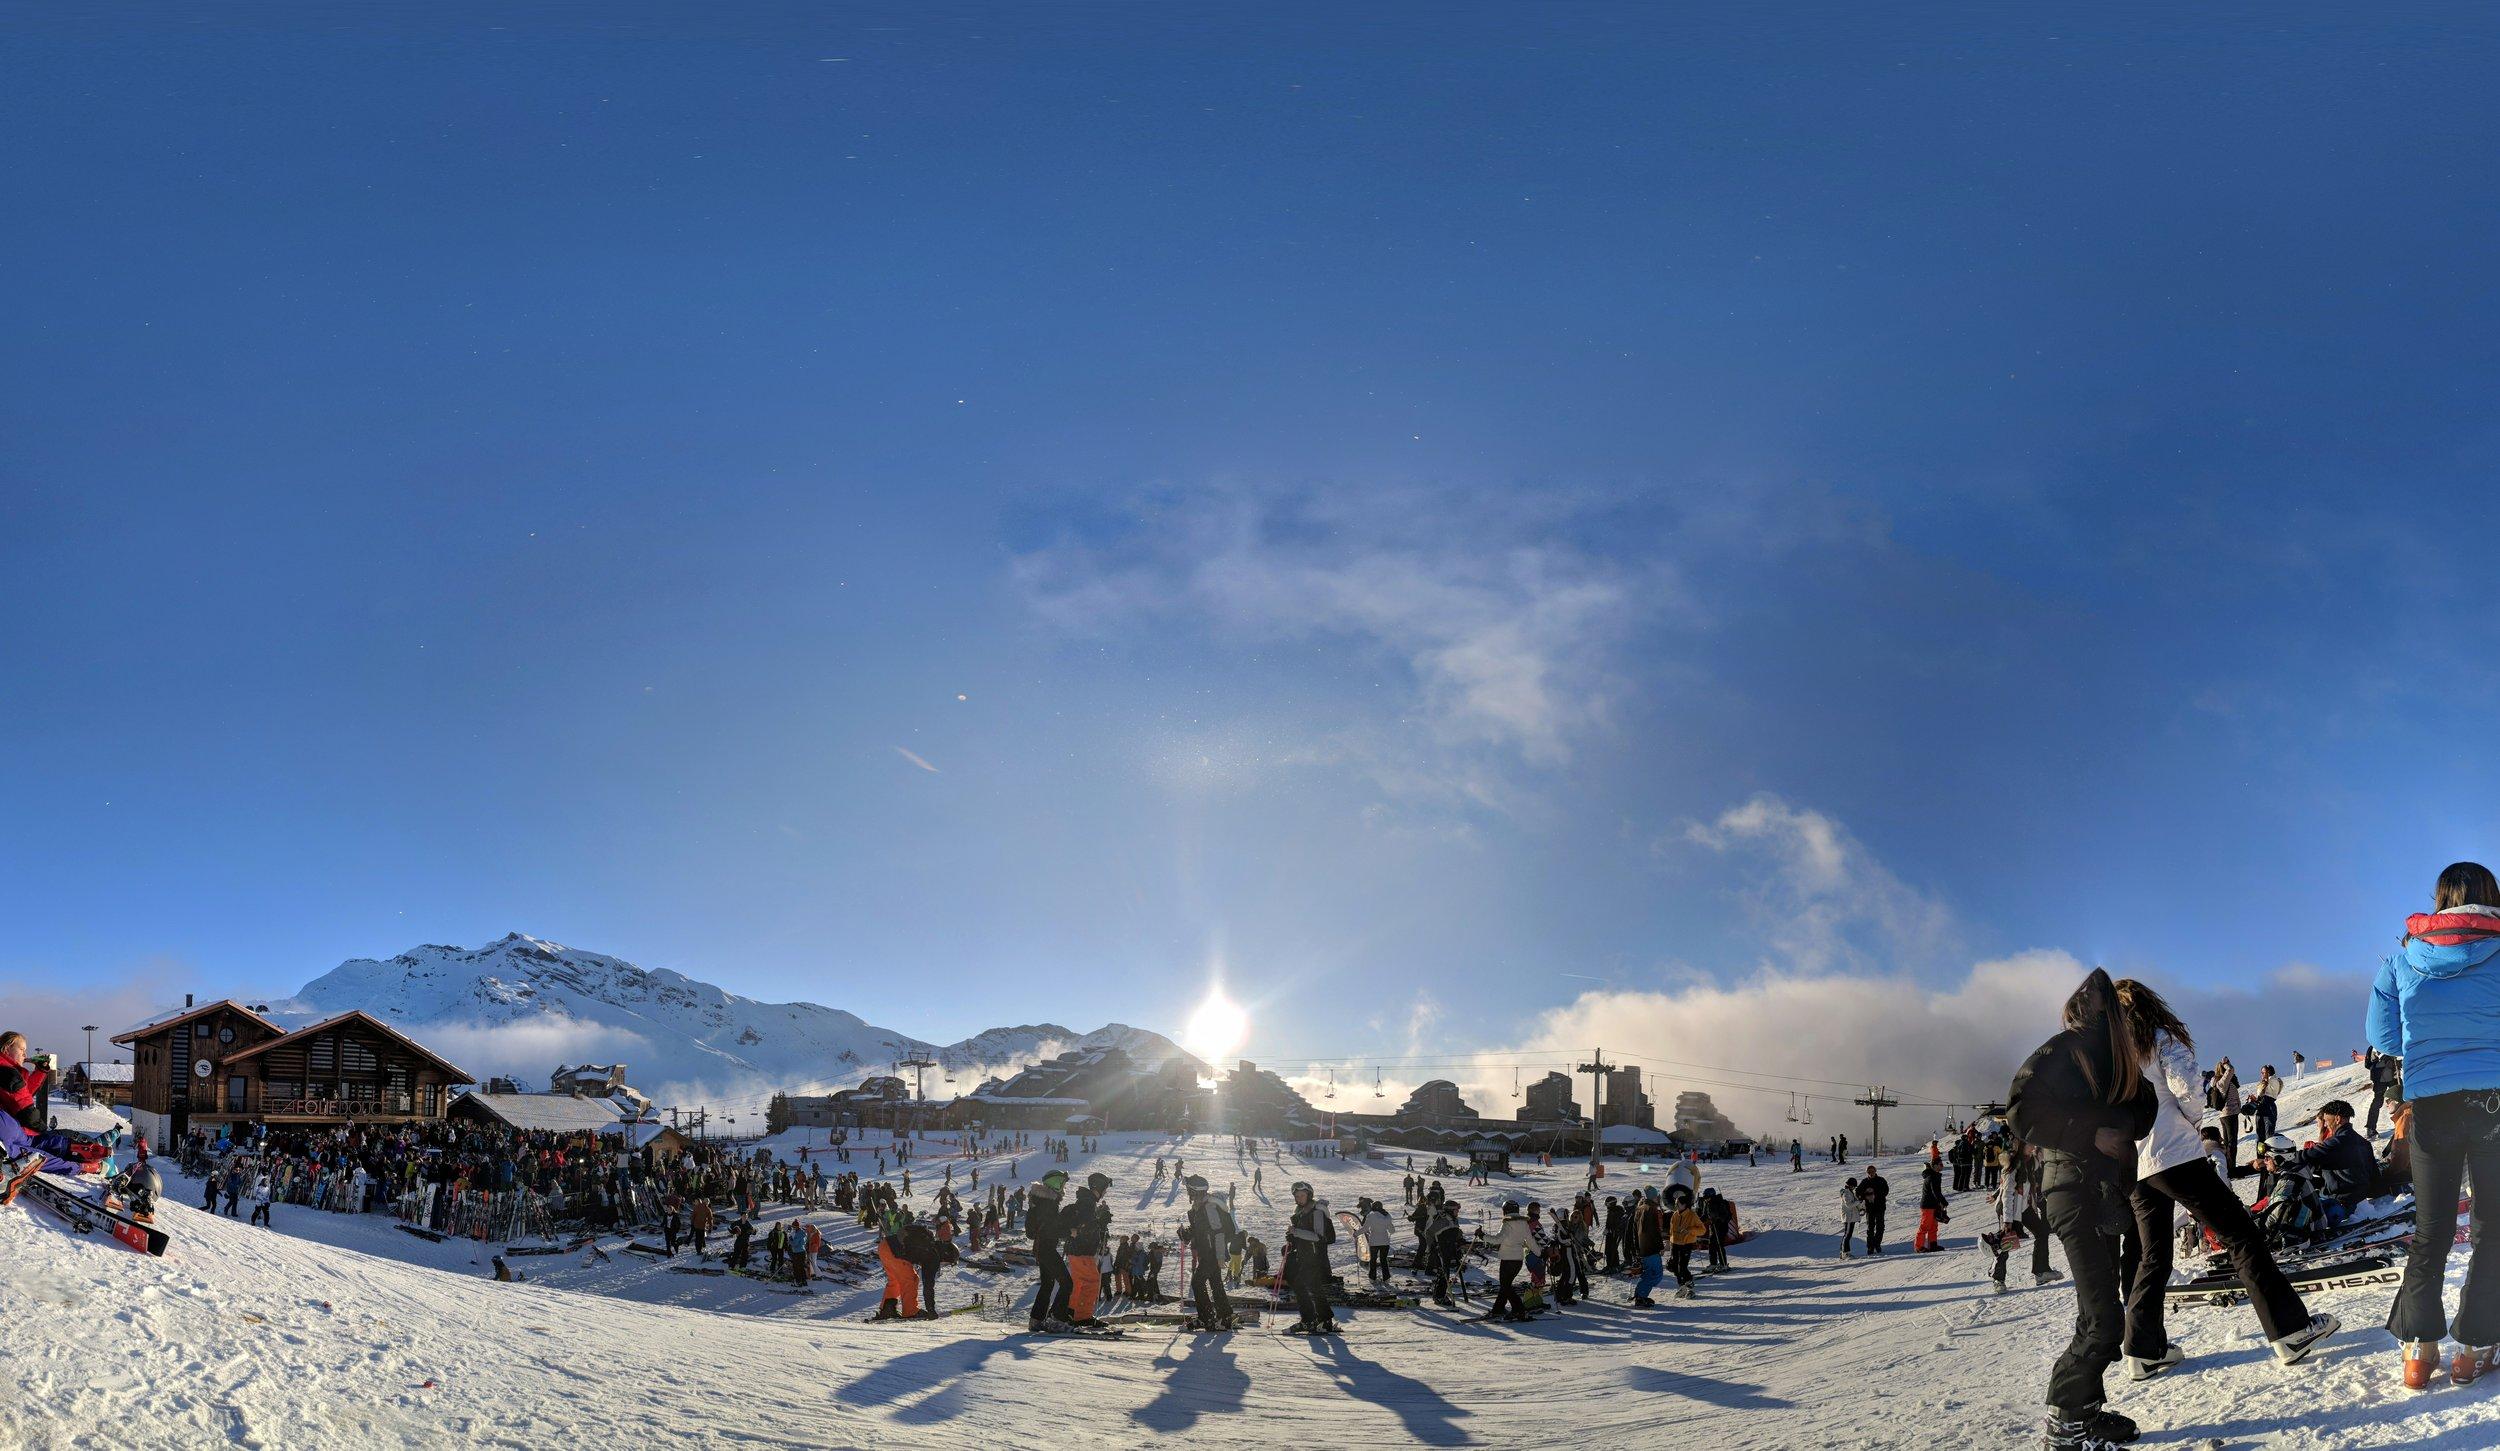 Après Ski Views in Avoriaz (Emily visit Jan 2019)